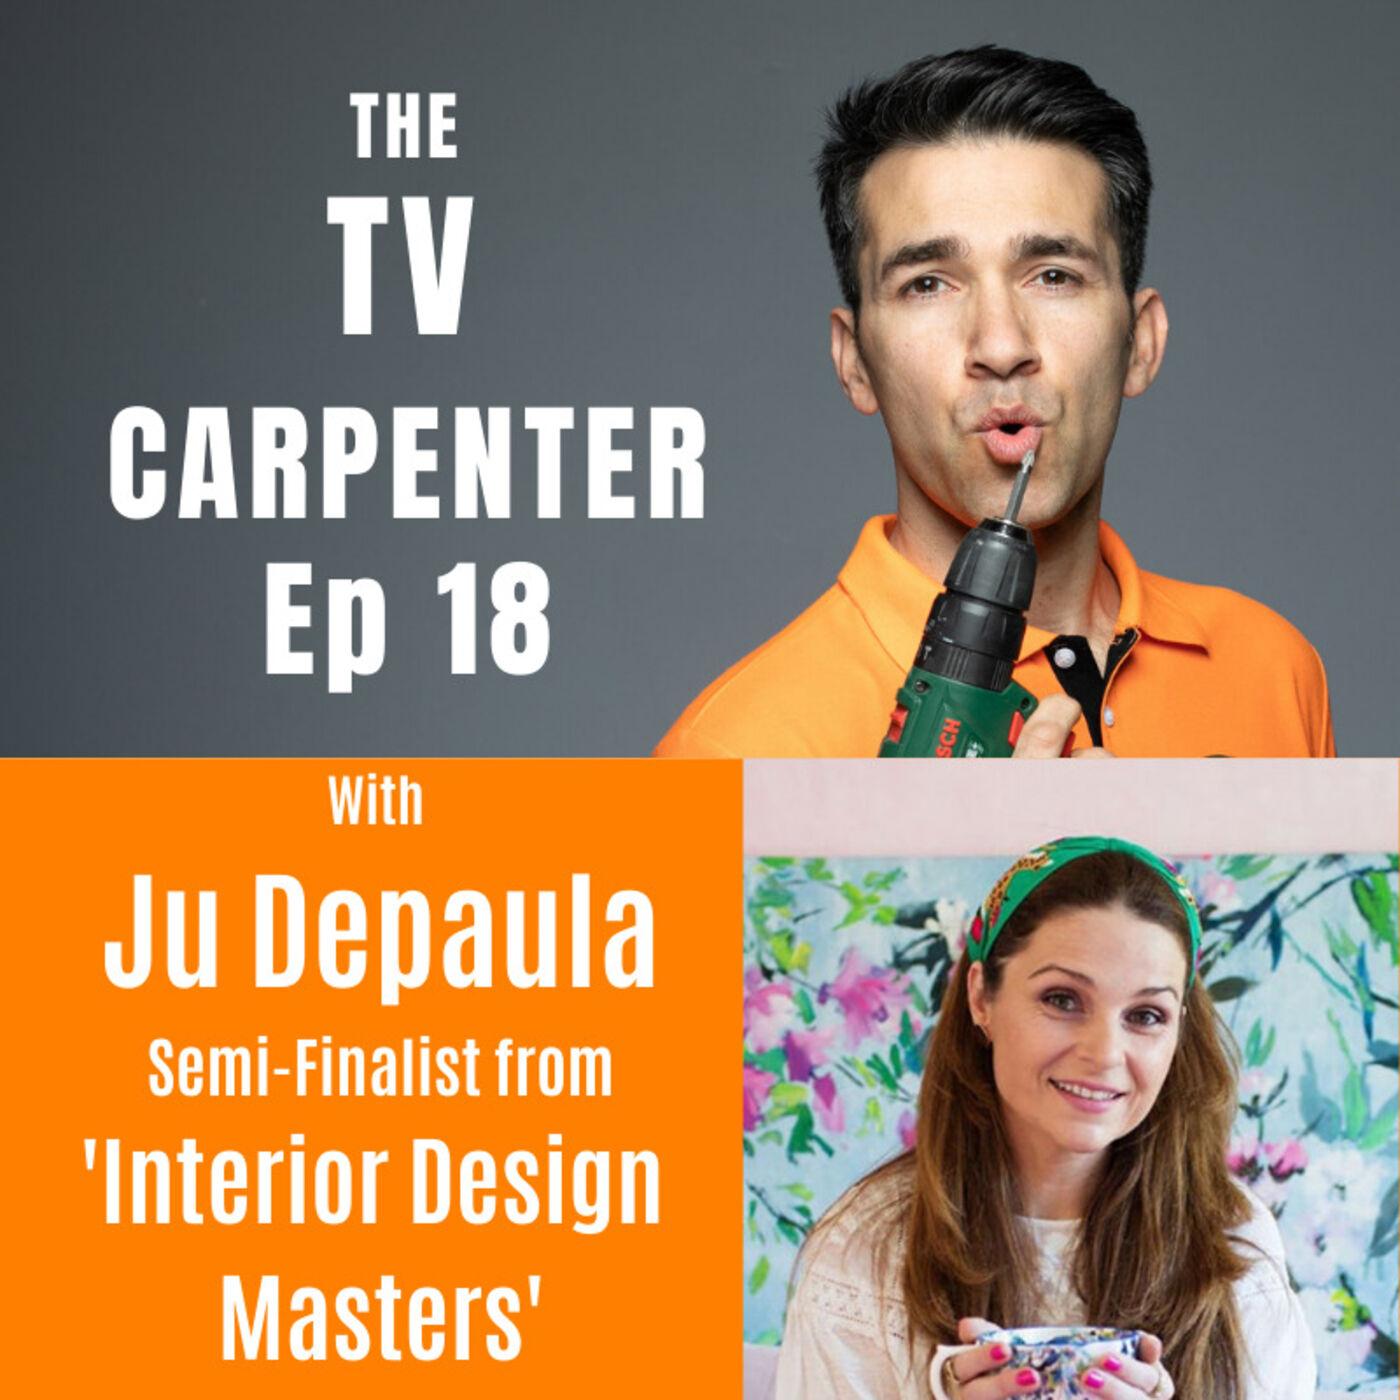 Wayne chats with Ju Depaula Semi-finalist from 'Interior Design Masters'